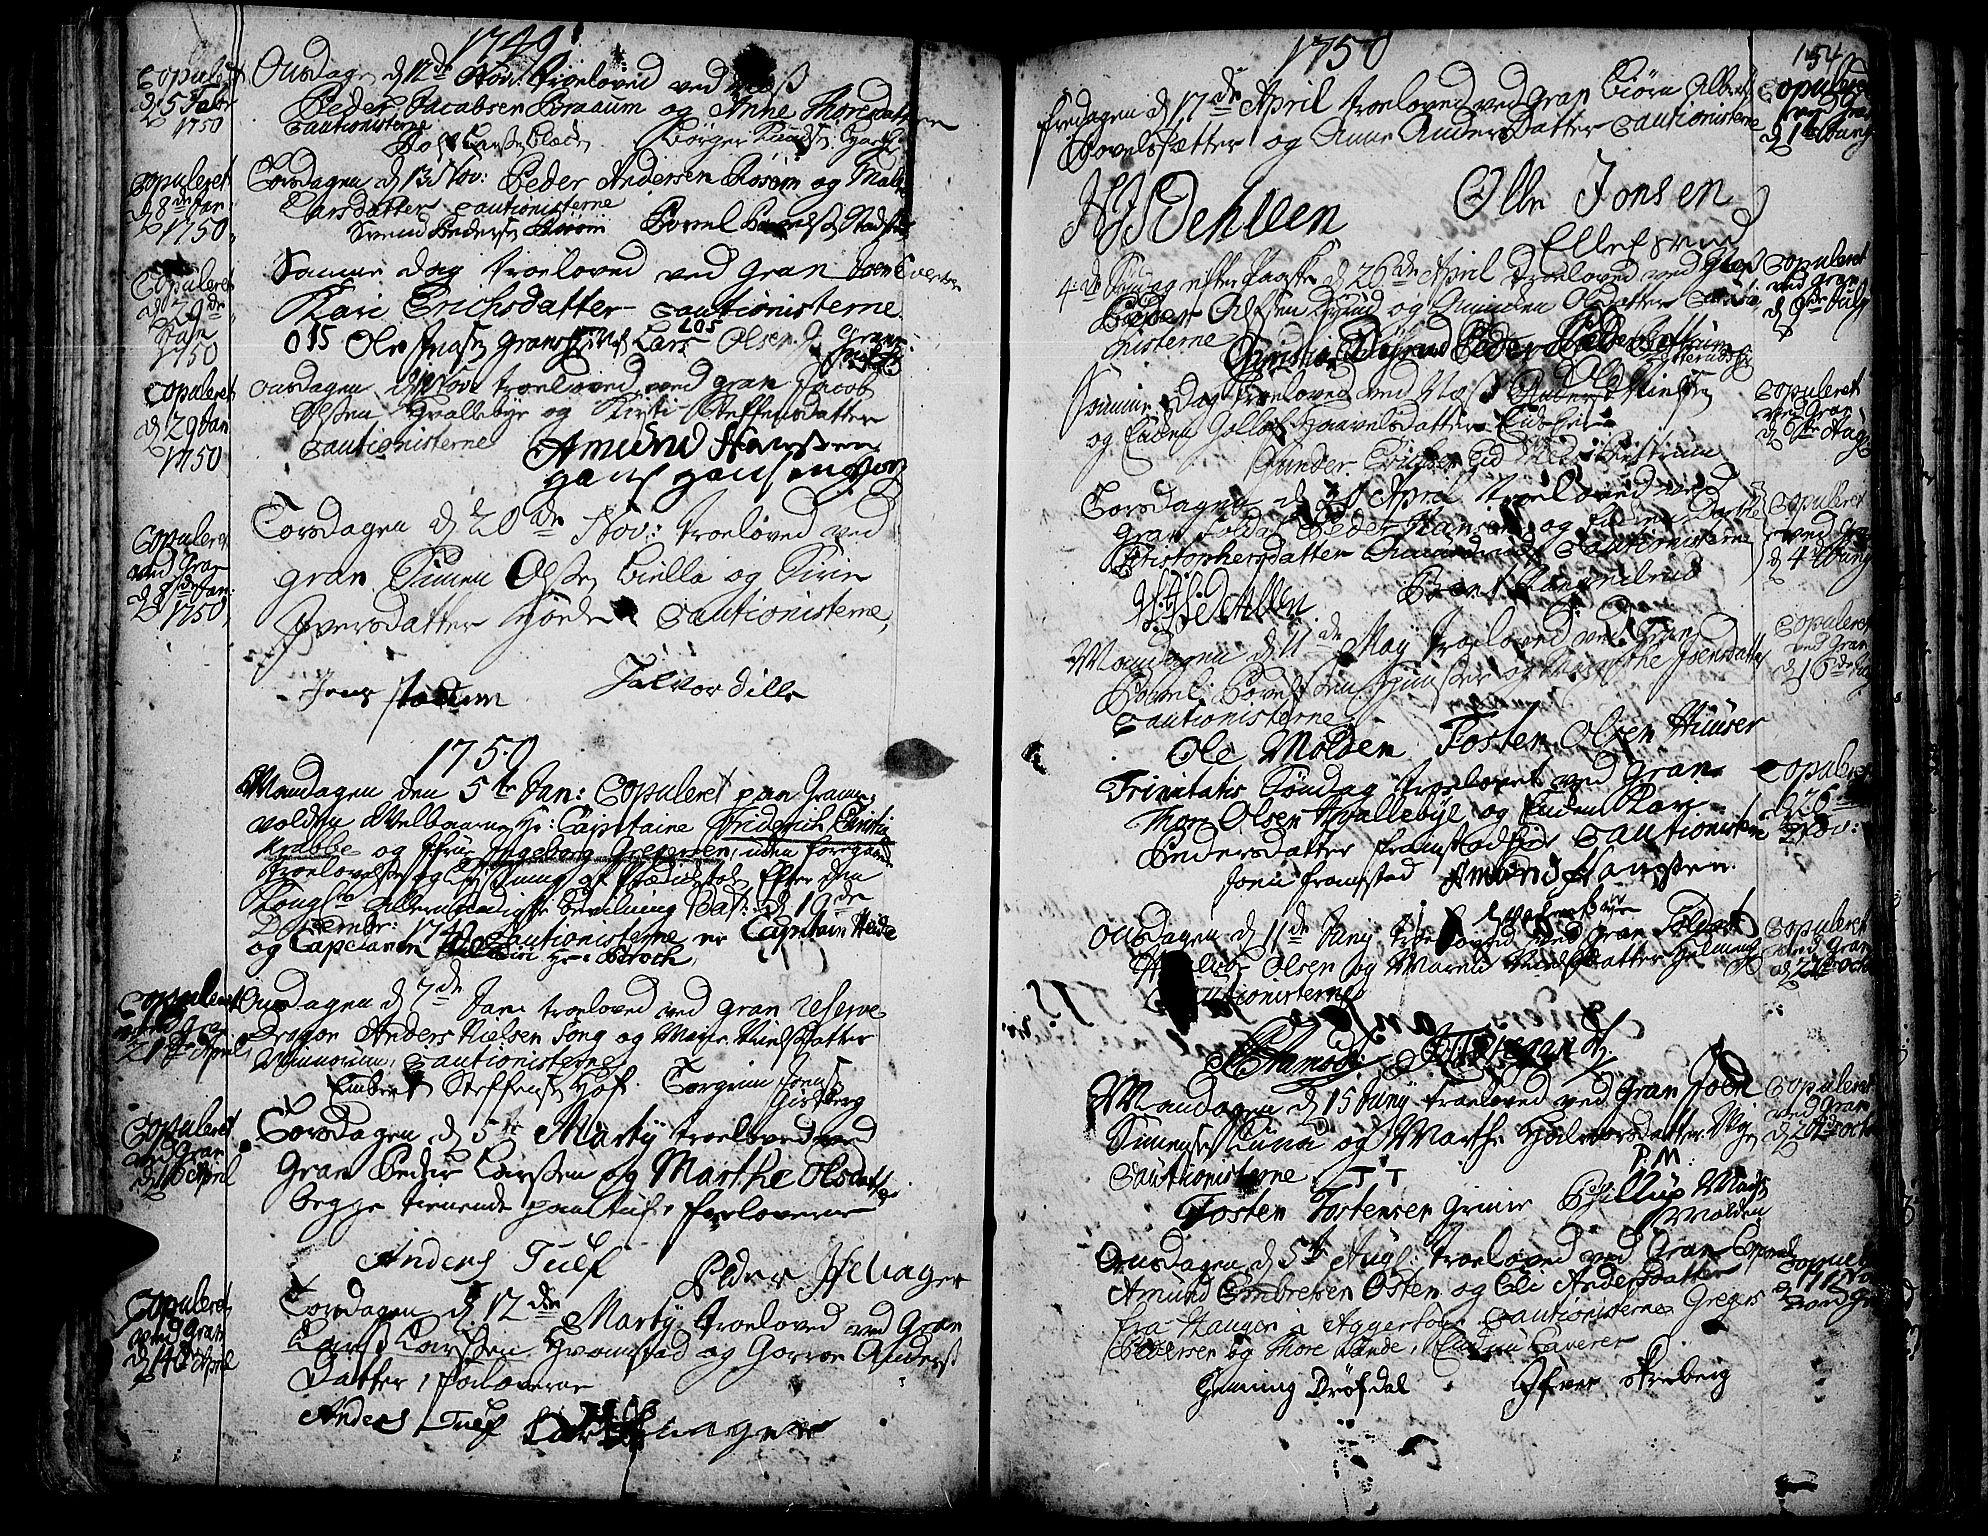 SAH, Gran prestekontor, Ministerialbok nr. 3, 1745-1758, s. 154